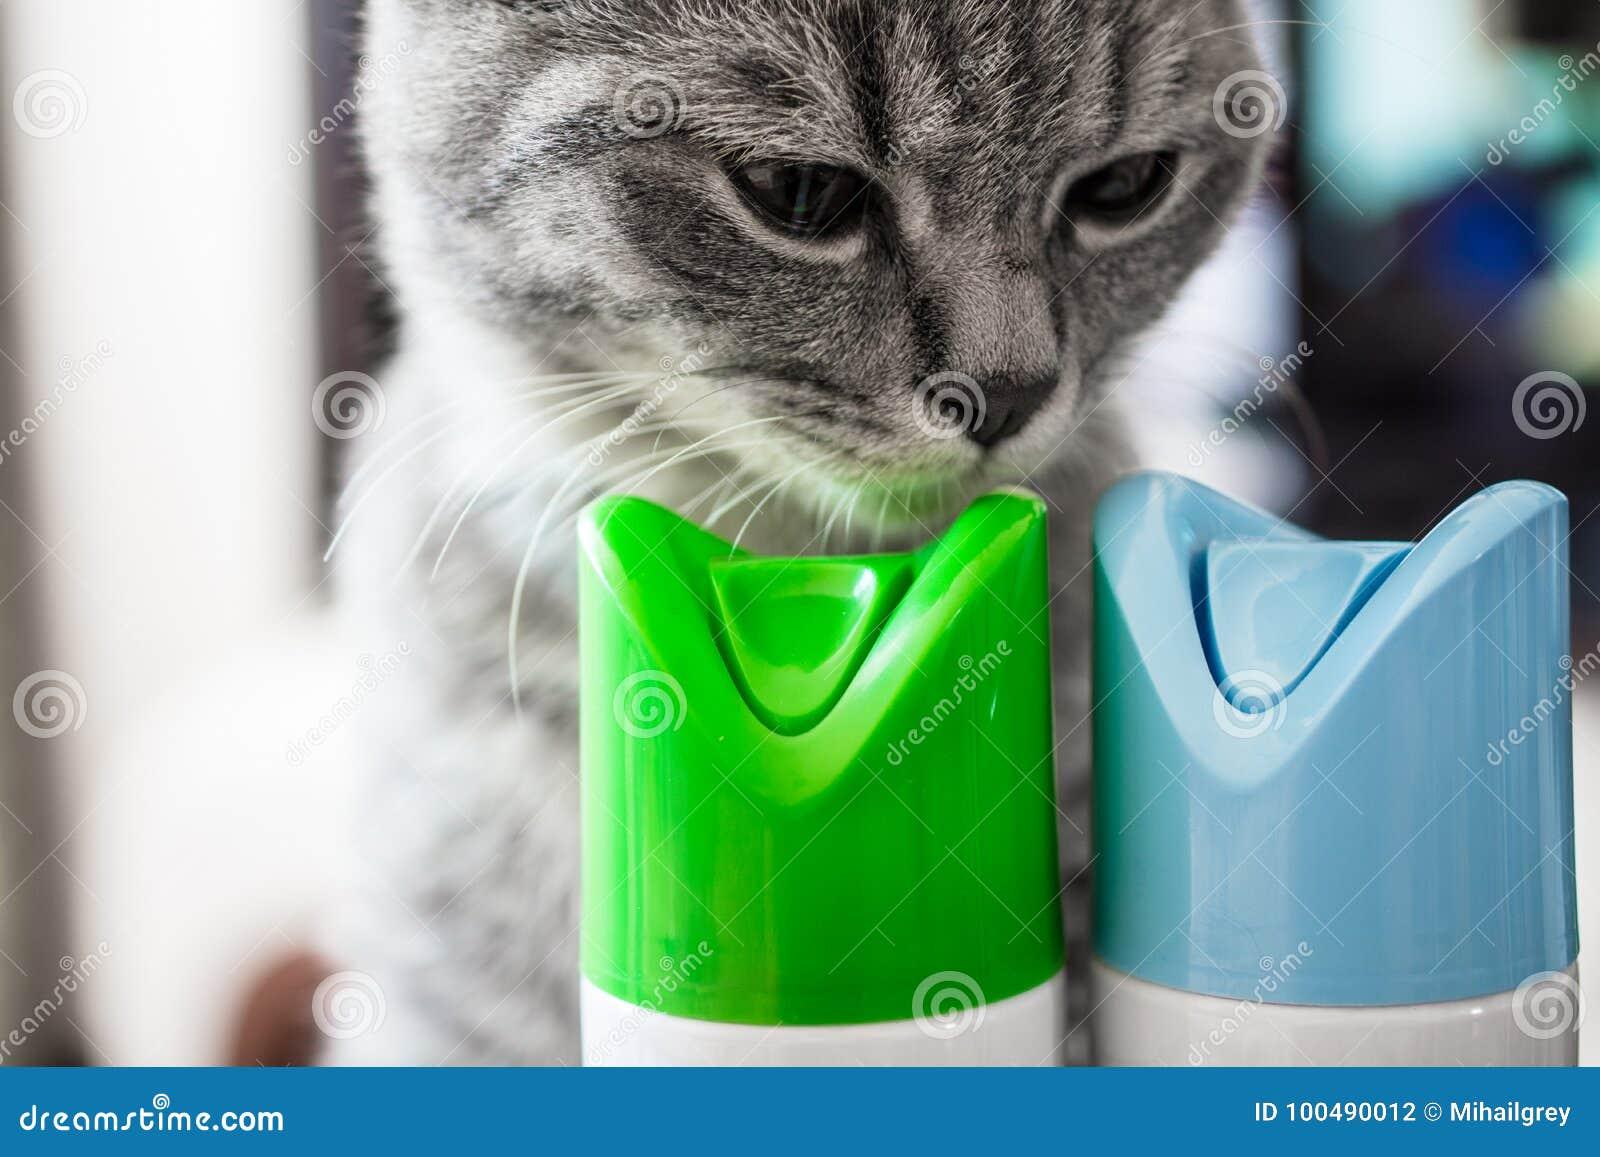 Kot obwąchuje butlę lotniczy freshener